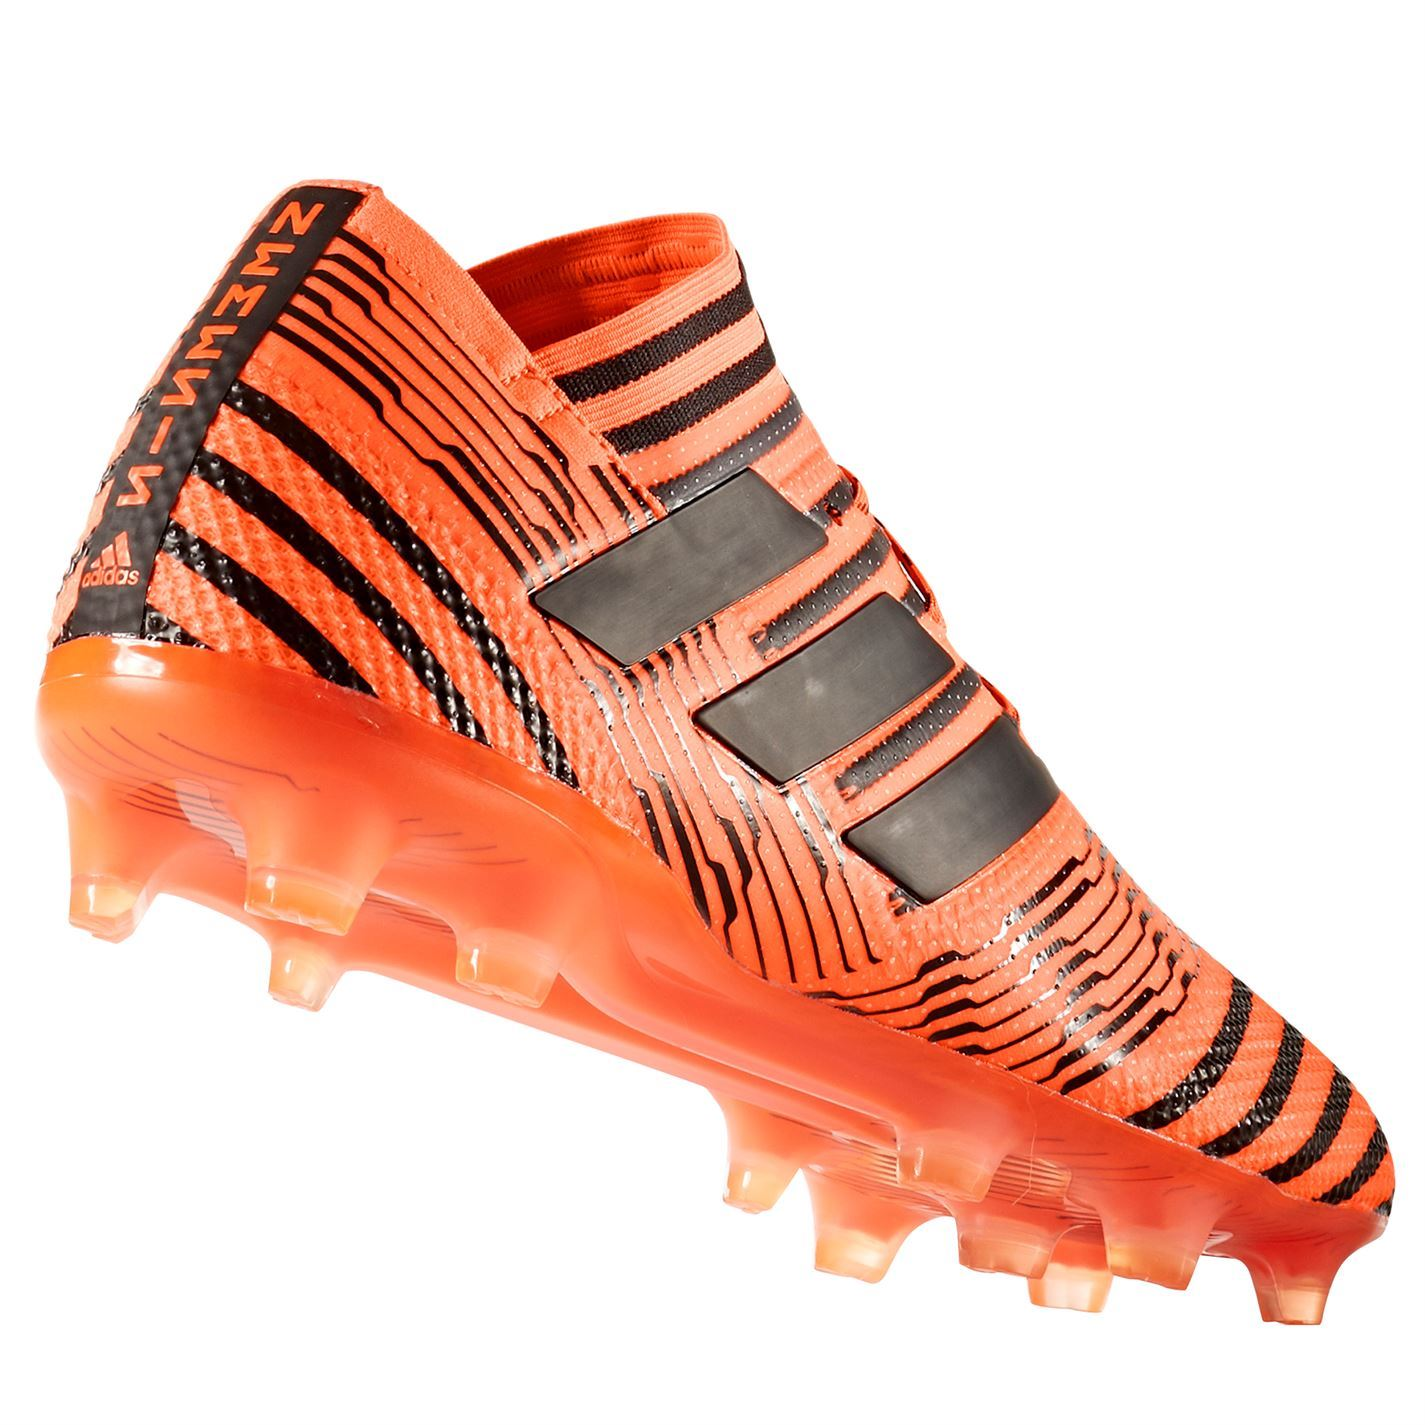 c4ec3819fae ... adidas Nemeziz 17.1 Firm Ground Football Boots Mens Orange Black Soccer  Cleats